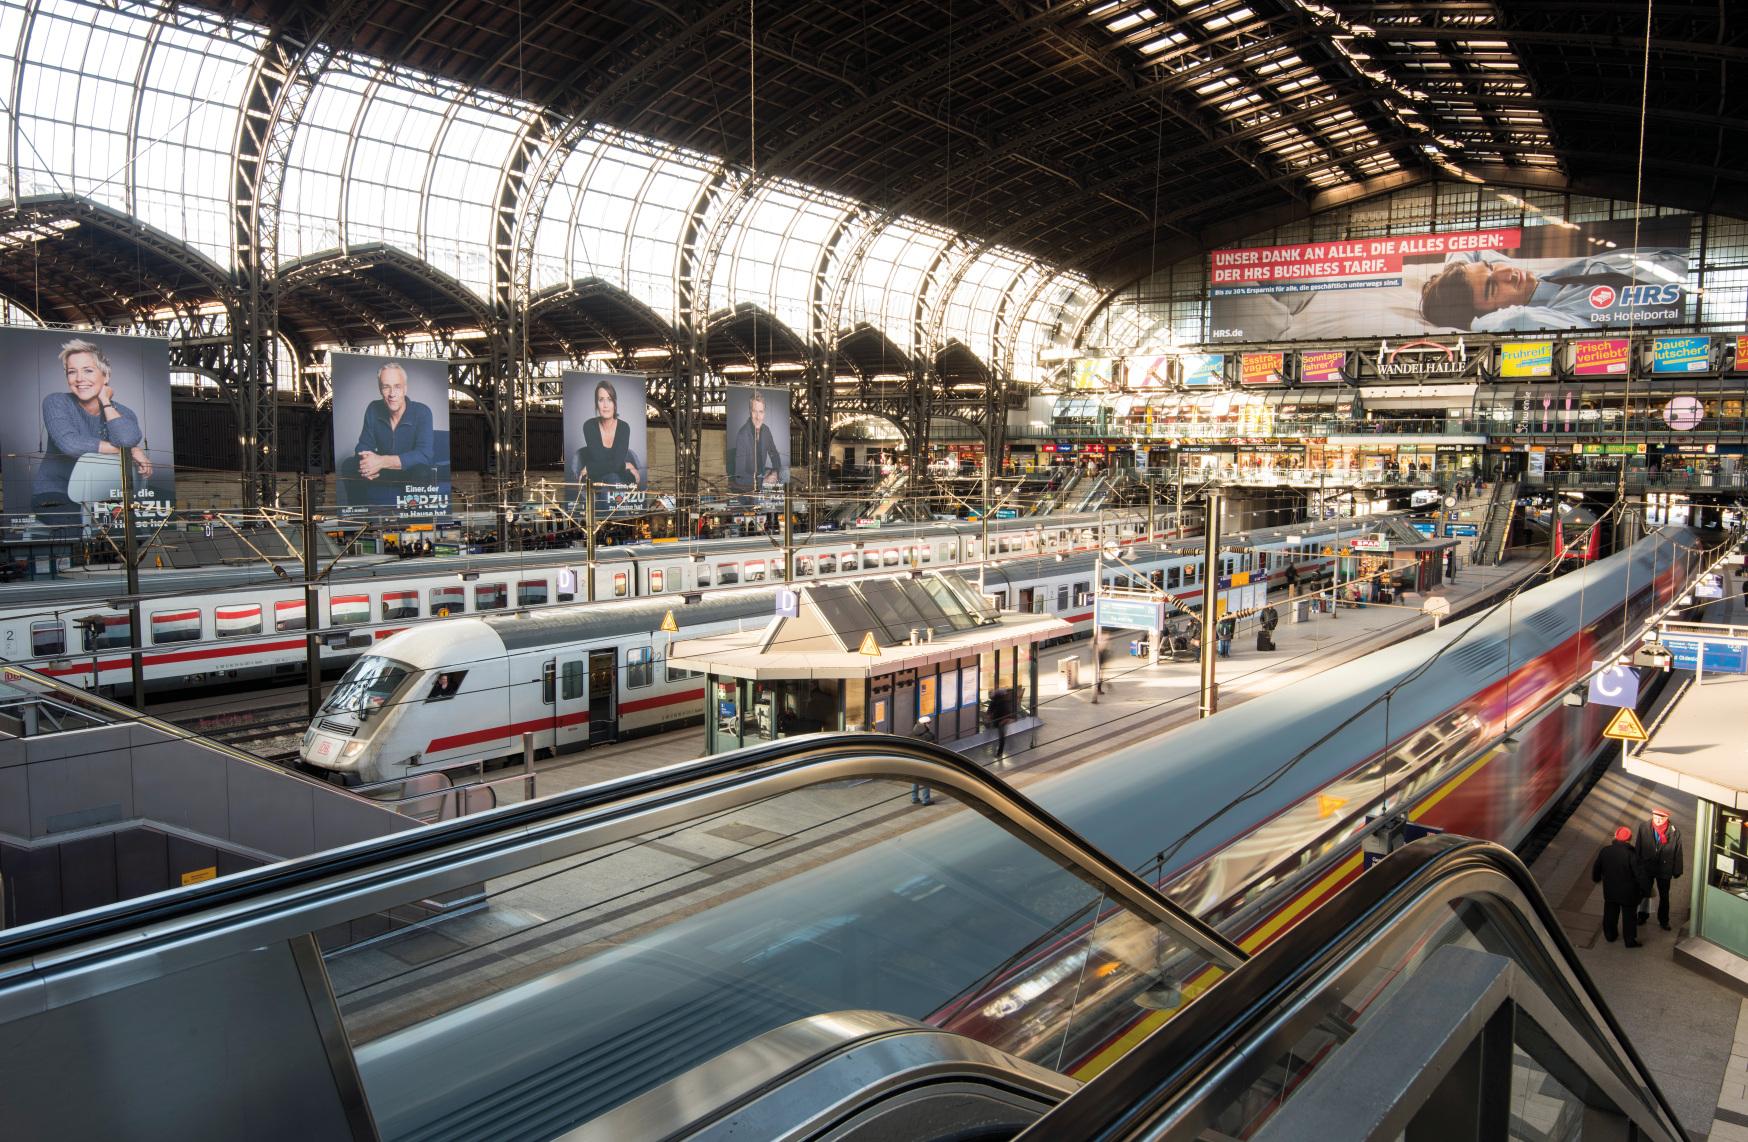 competition Hamburg's main train station